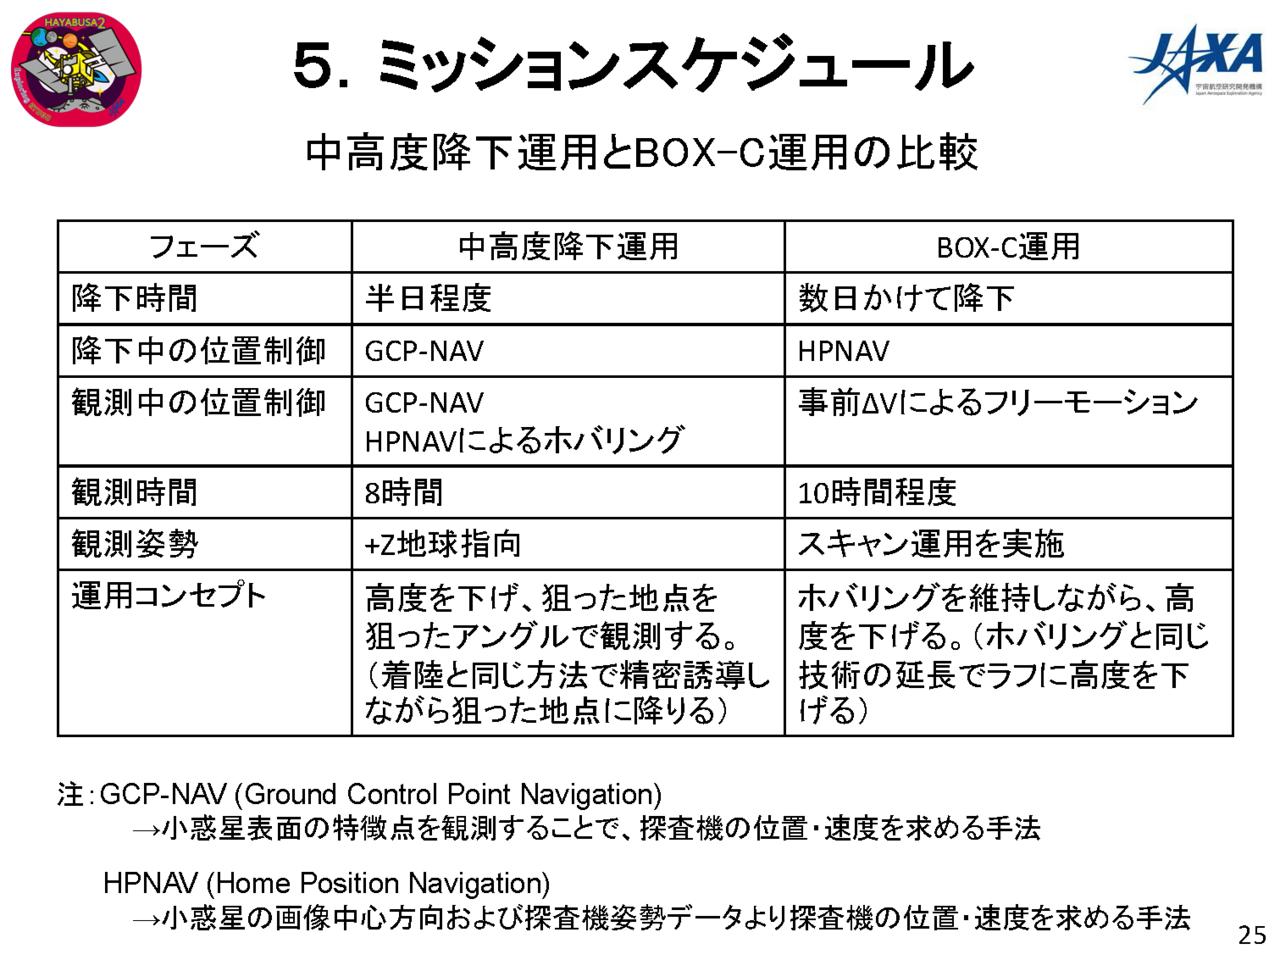 f:id:Imamura:20180802145945p:plain